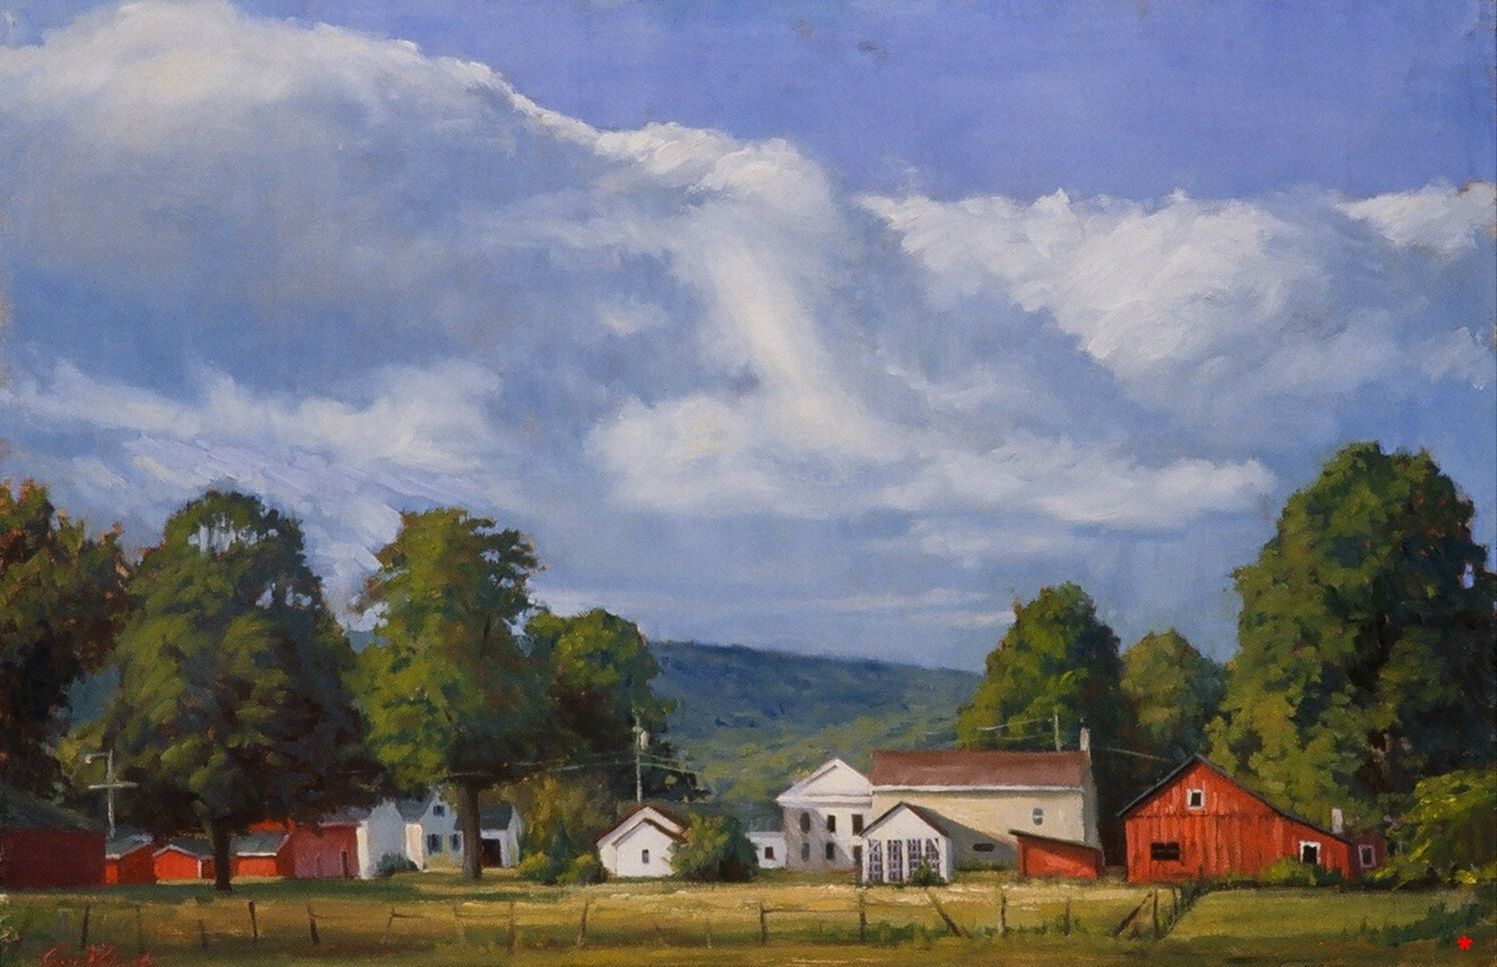 Jesica Dalrymple Cloud Bank 24 x 36 oil on canvas.jpg